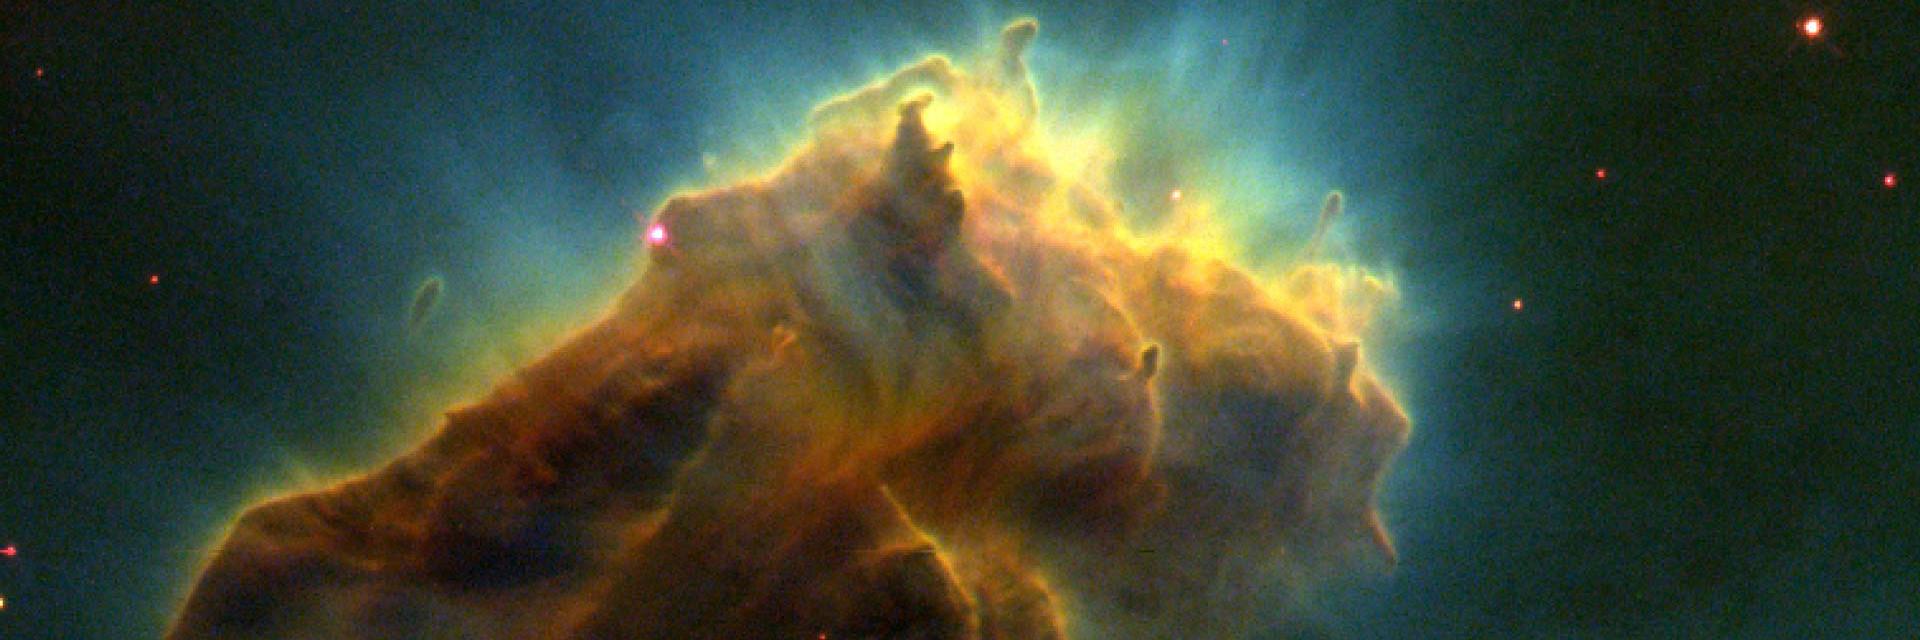 Nebula banner